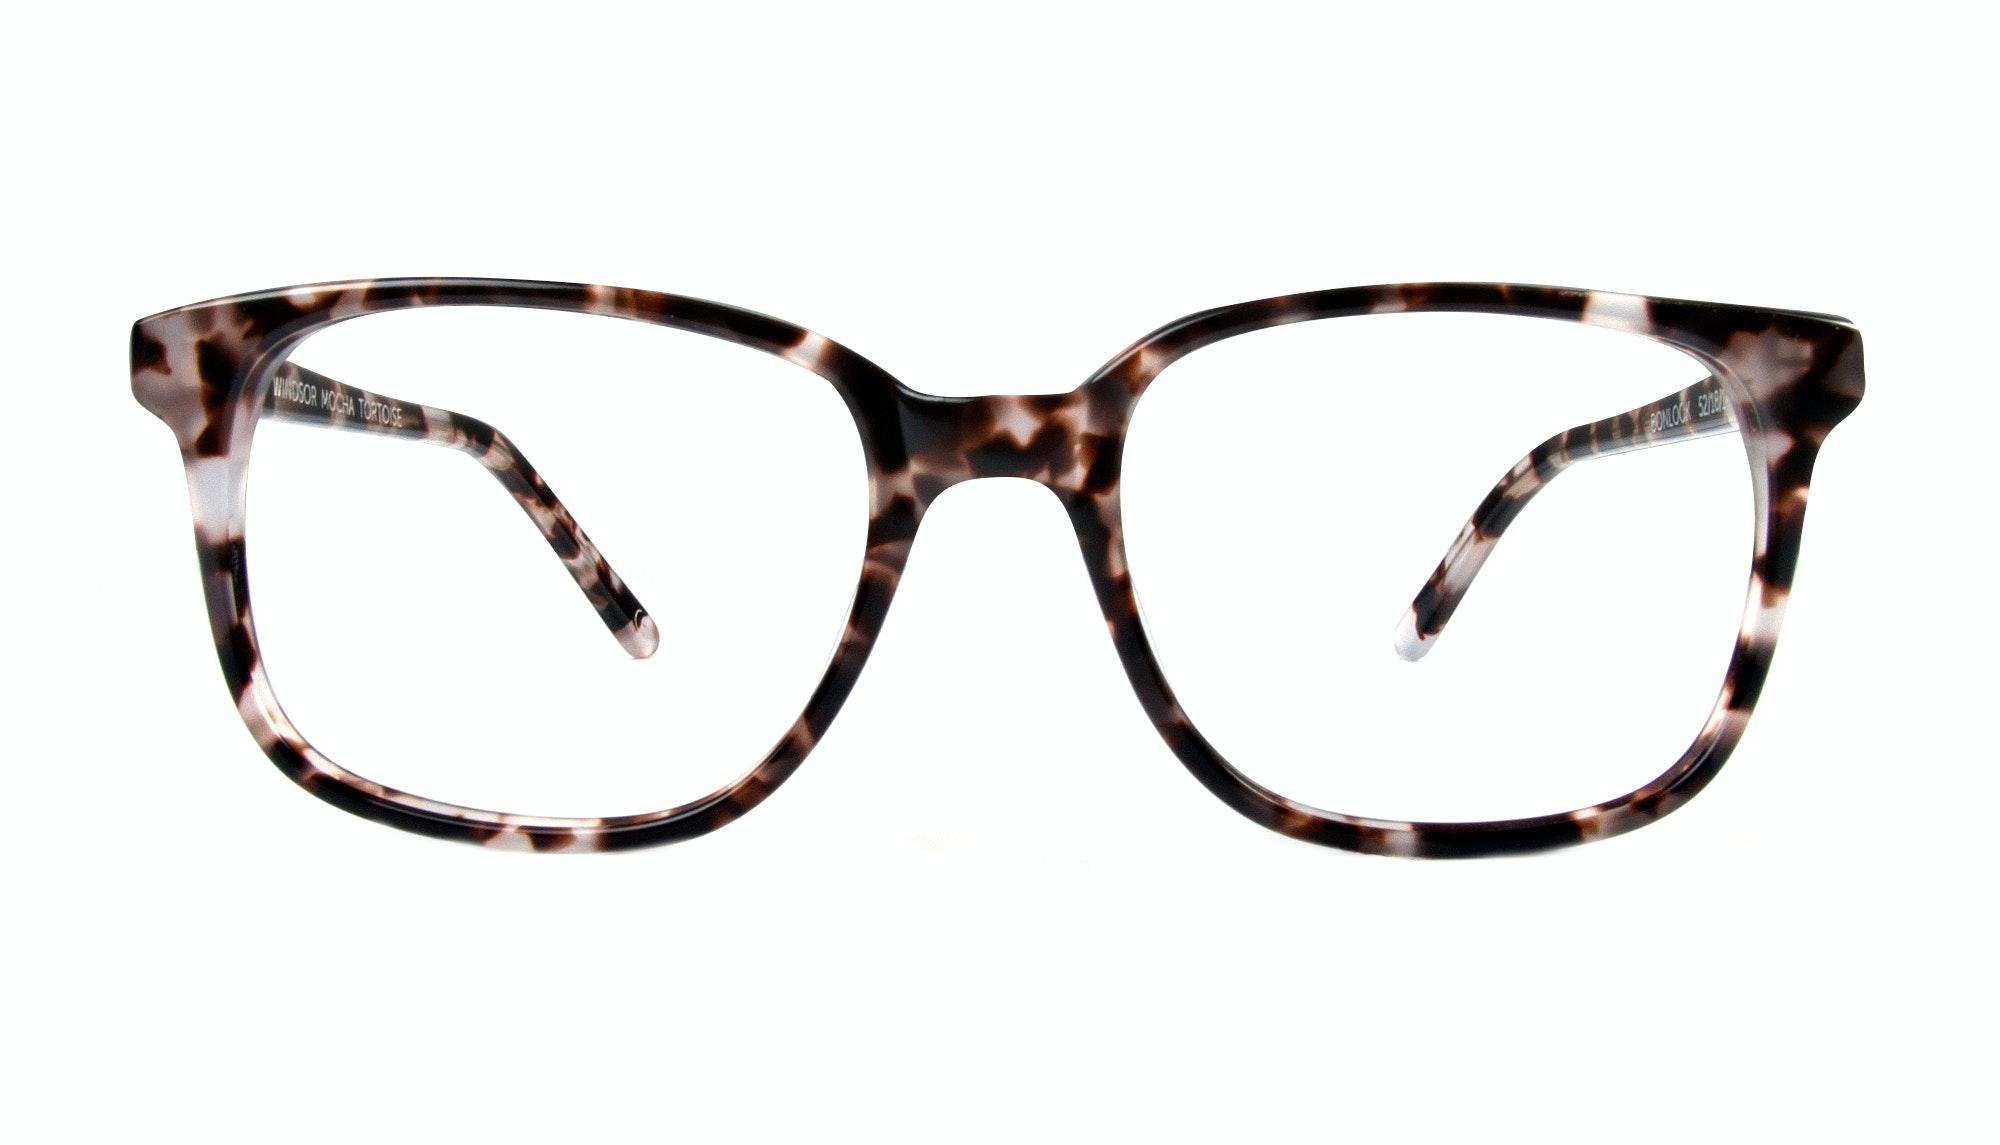 Affordable Fashion Glasses Rectangle Square Eyeglasses Women Windsor Mocha Tortoise Front